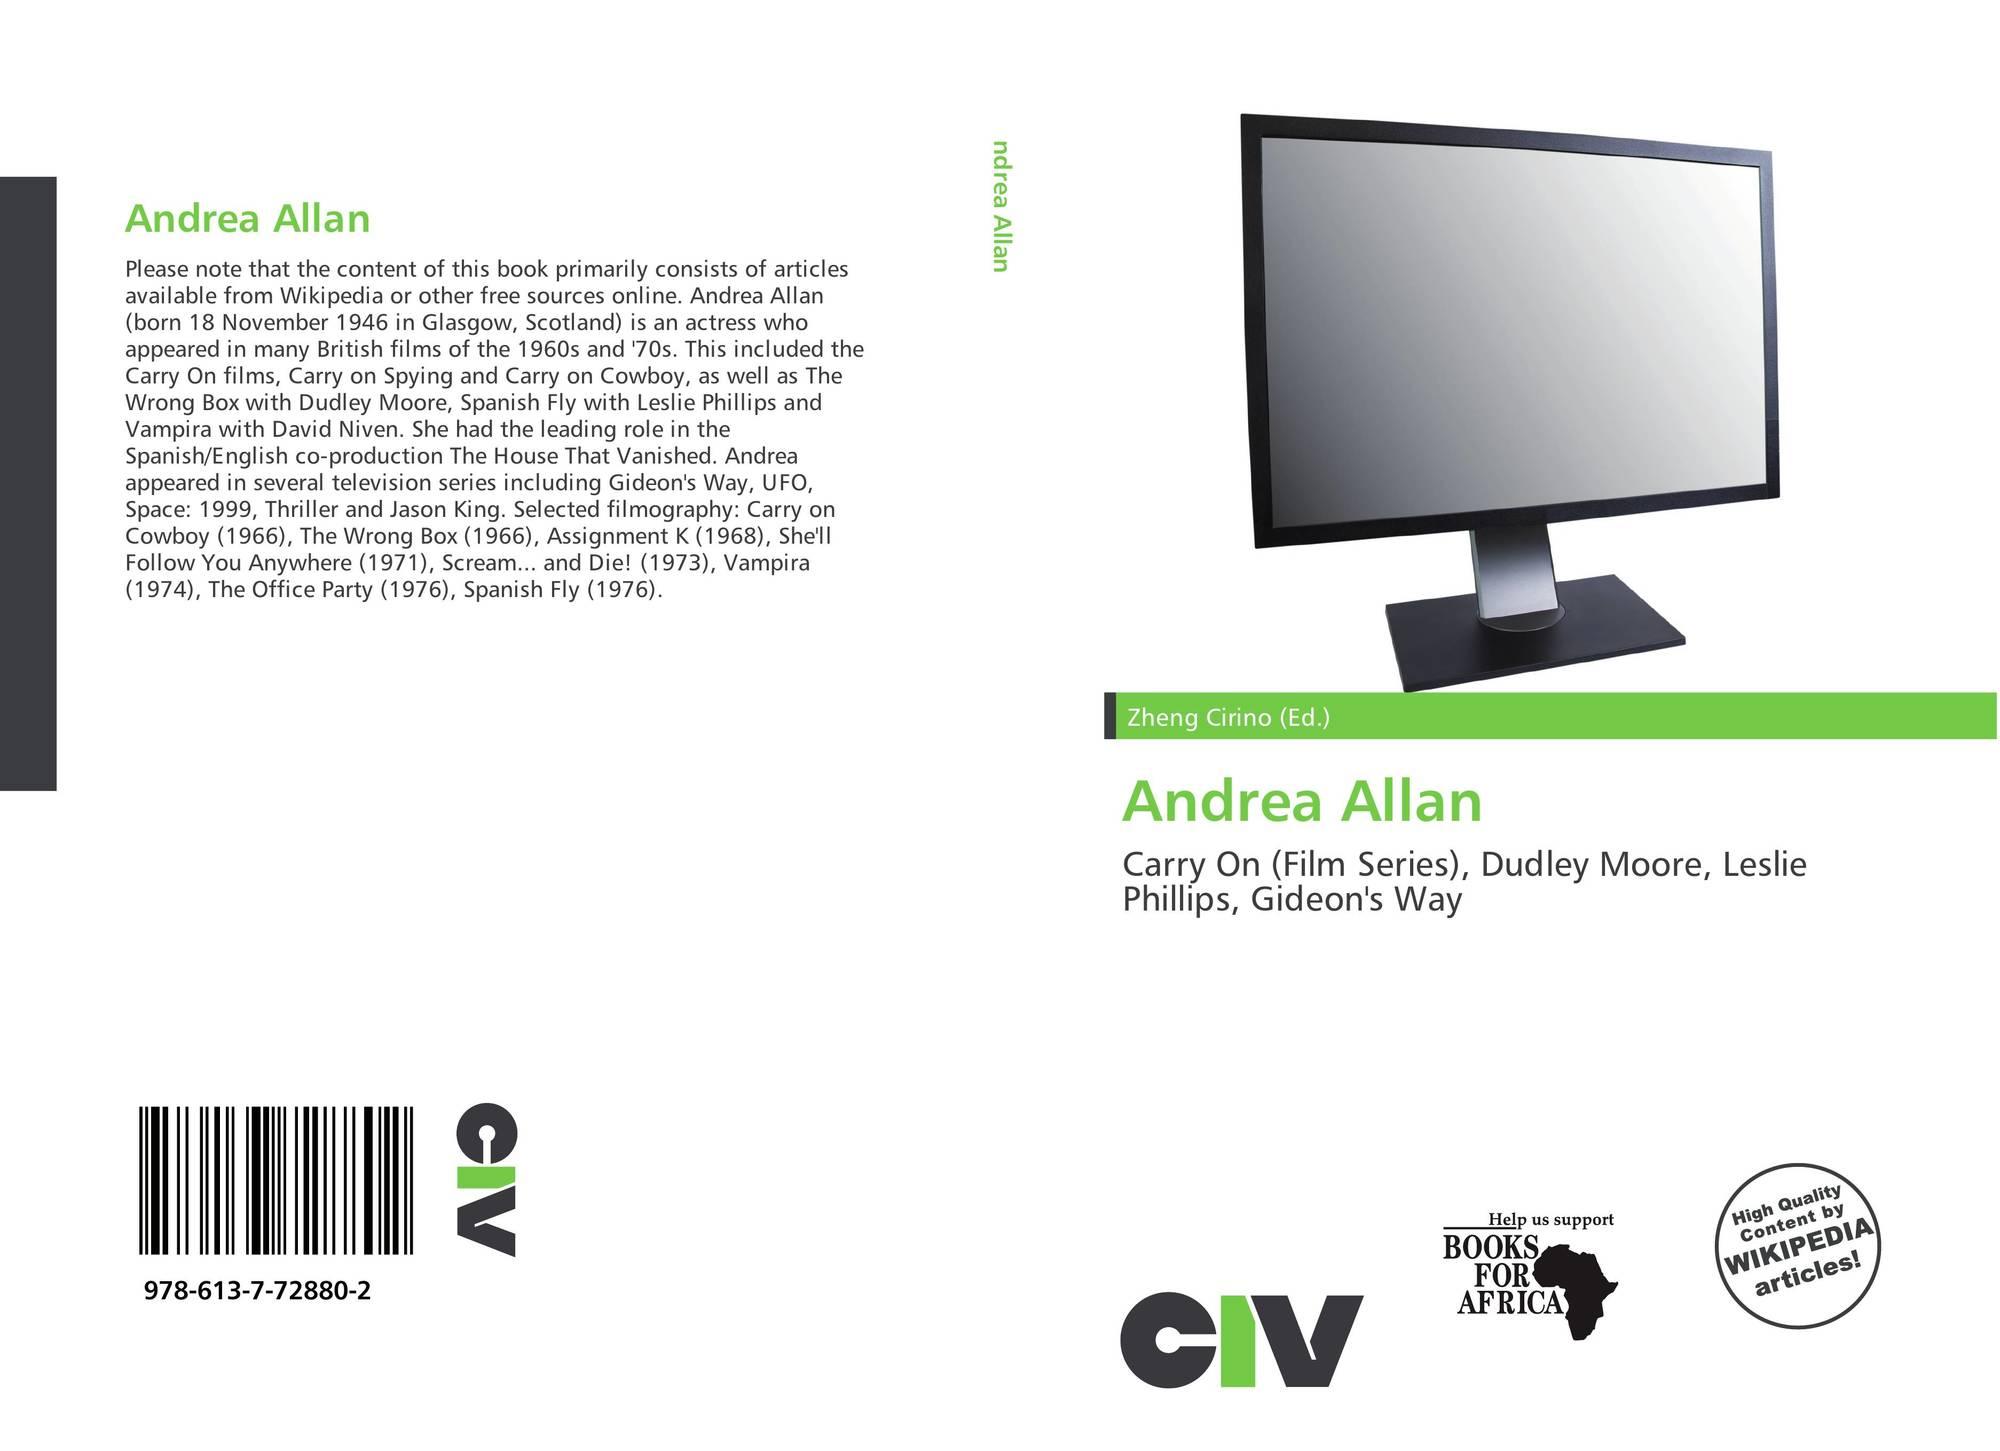 Andrea Allan andrea allan, 978-613-7-72880-2, 6137728803 ,9786137728802